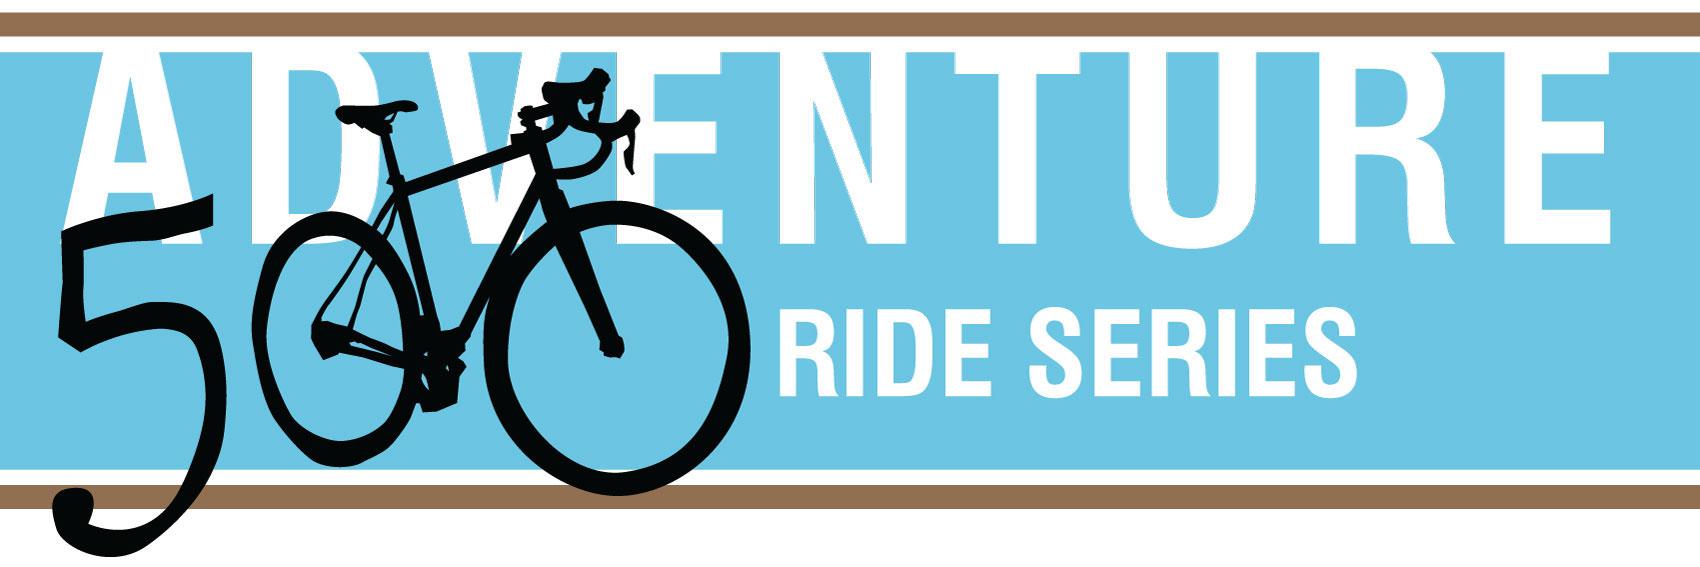 Adventure-500-Ride-Series-Logo-horizontal-190502_PLACEHOLDER.jpg